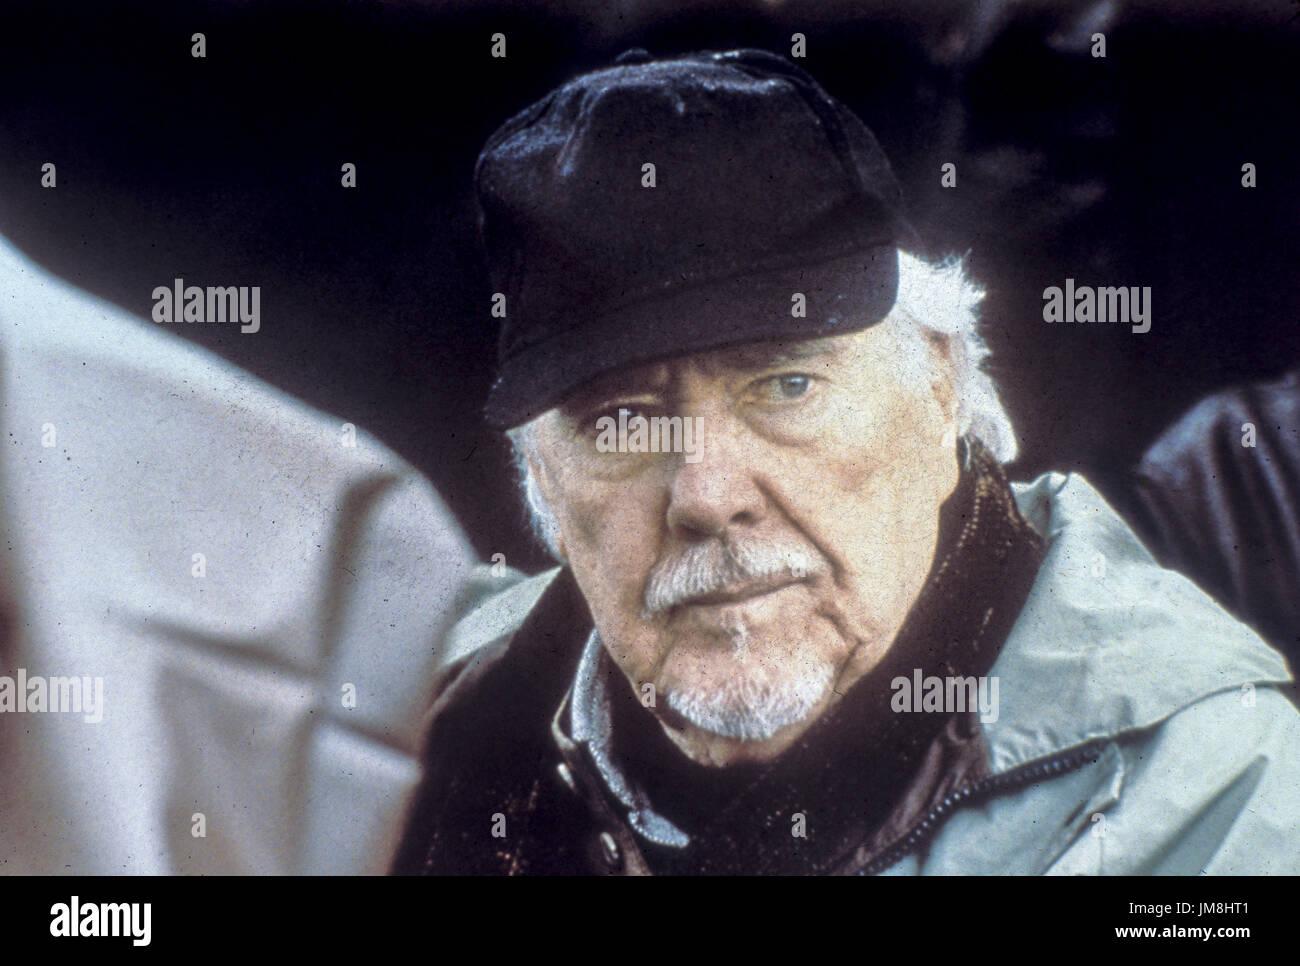 Robert Altman, gosford park, 2001 Immagini Stock